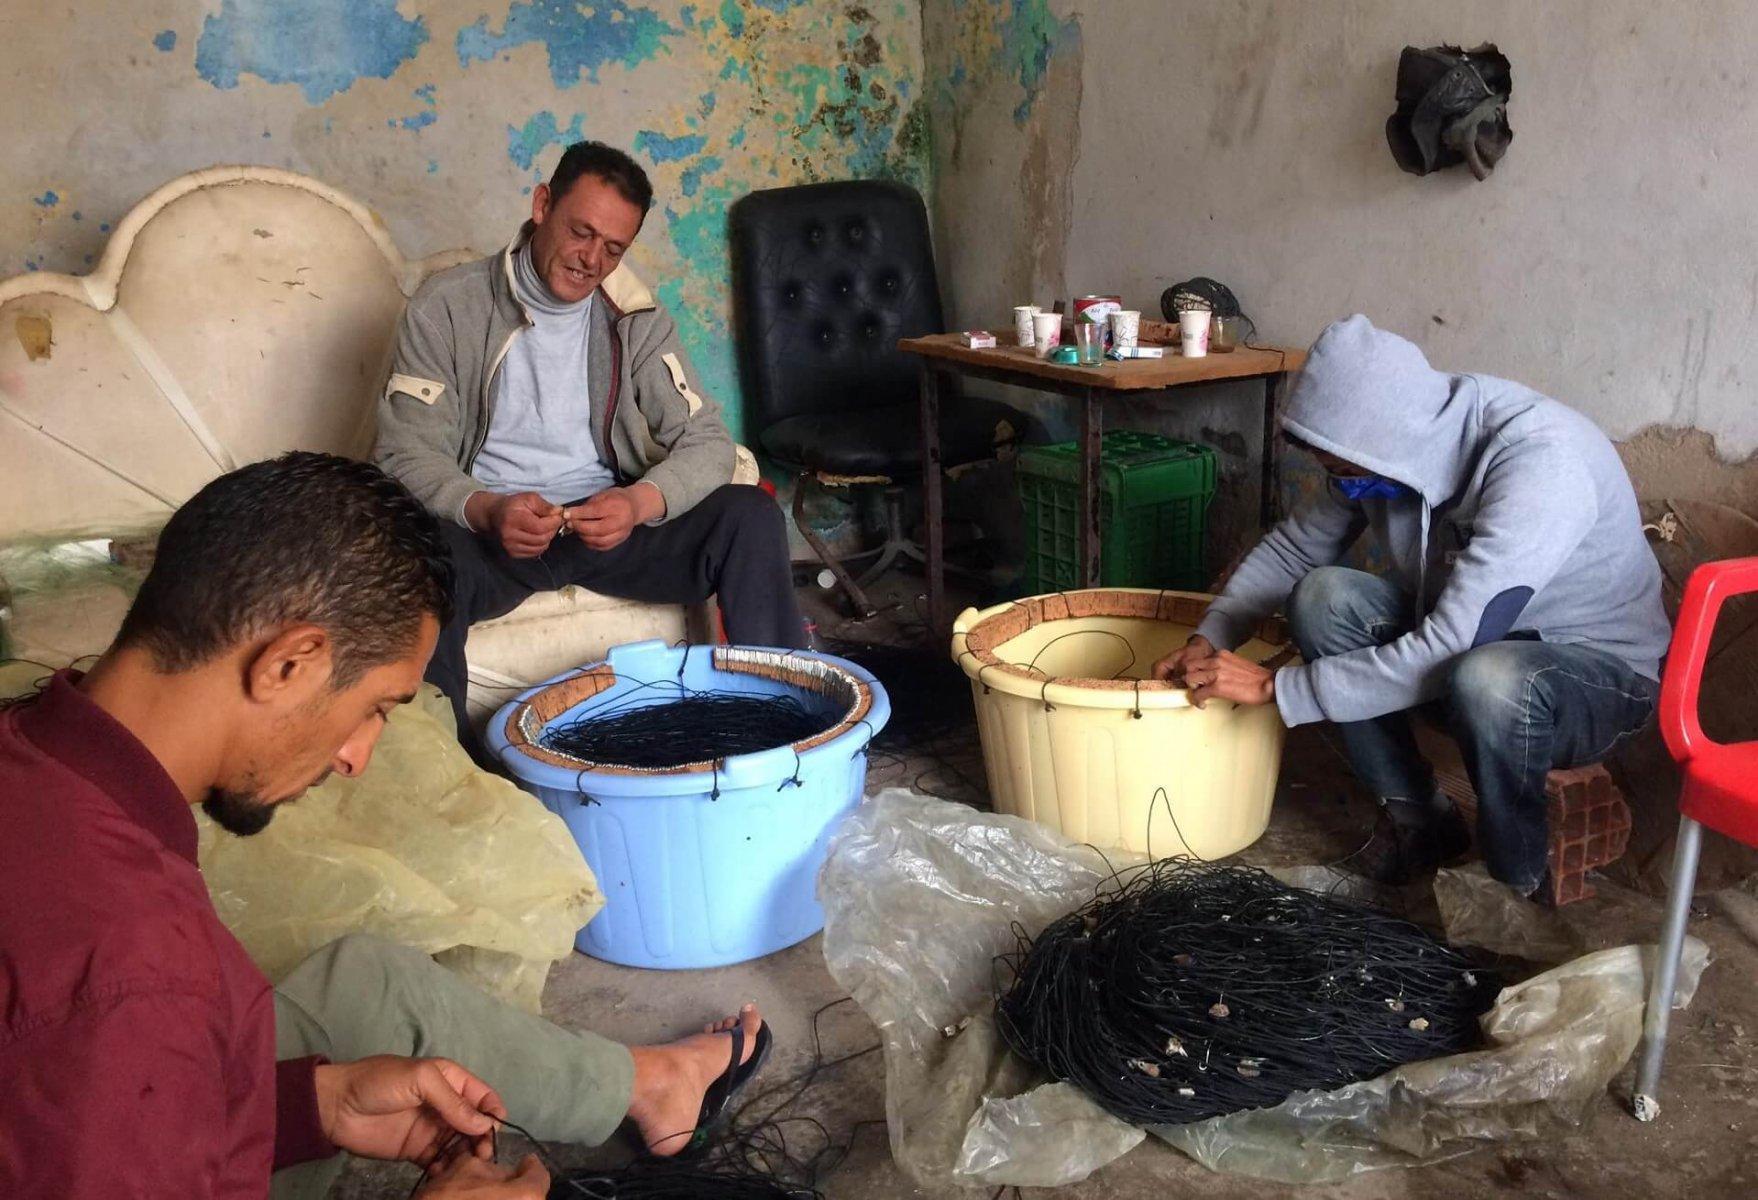 Fishers preparing their new equipment - © Khaled Ben Othman